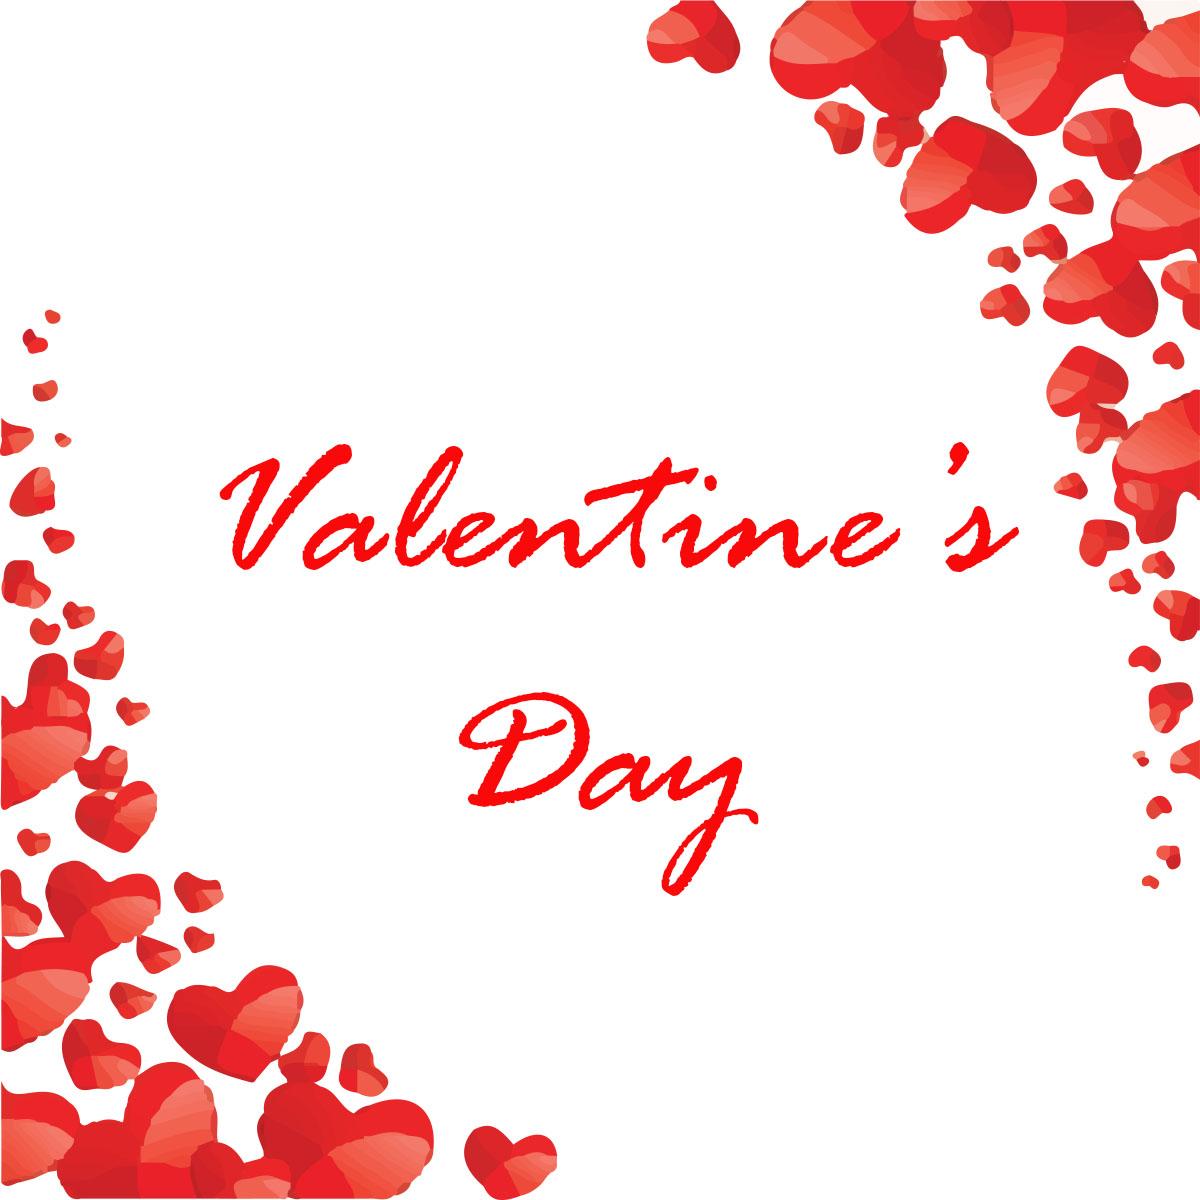 https://0901.nccdn.net/4_2/000/000/038/2d3/valentine-s-day.jpg